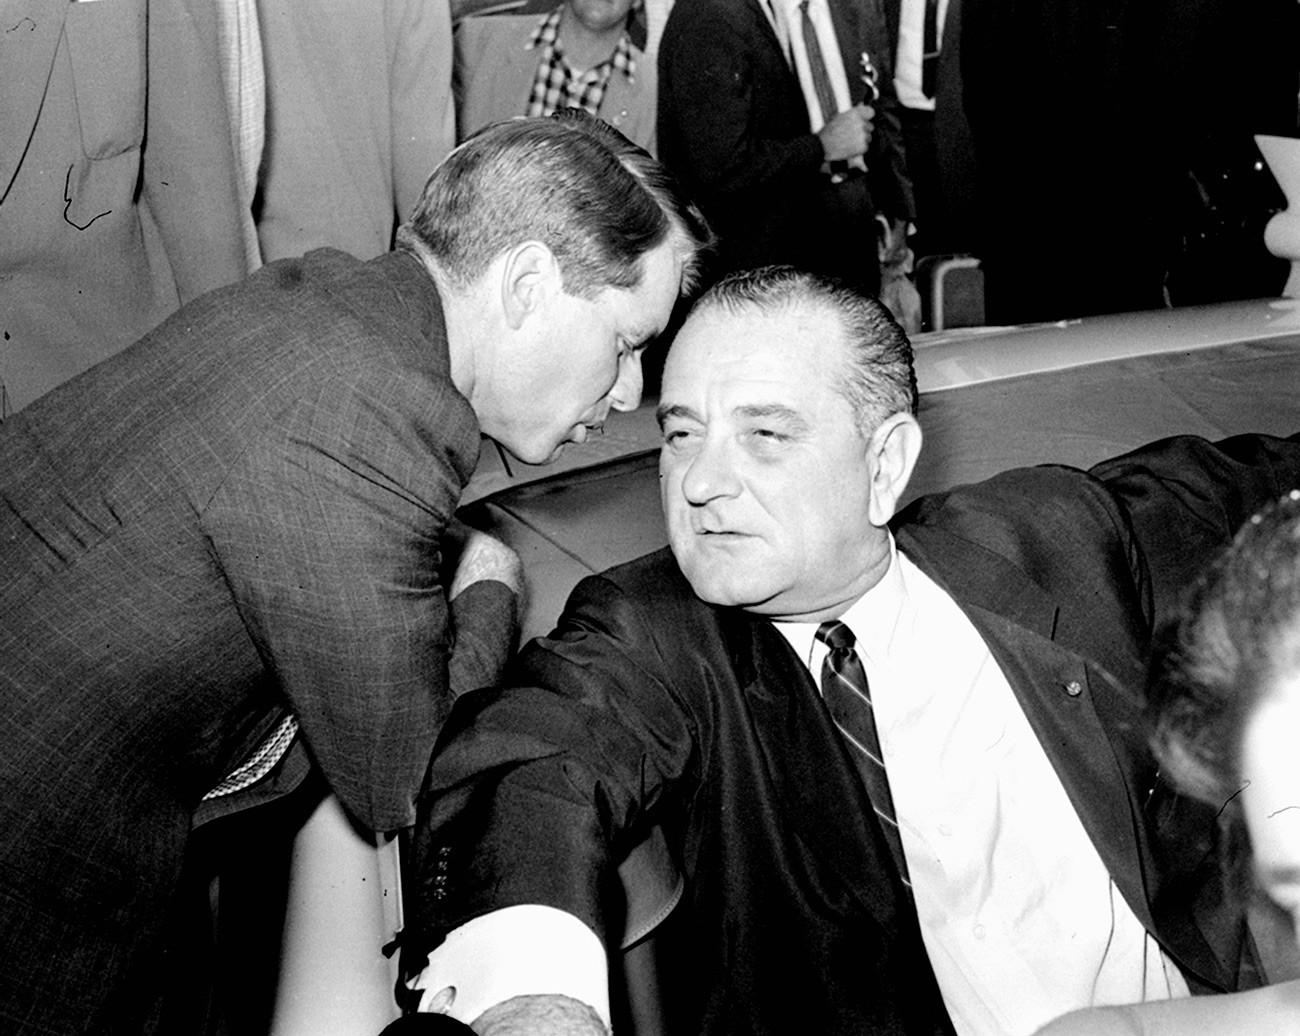 Роберт Кенеди и Линдон Џонсон.